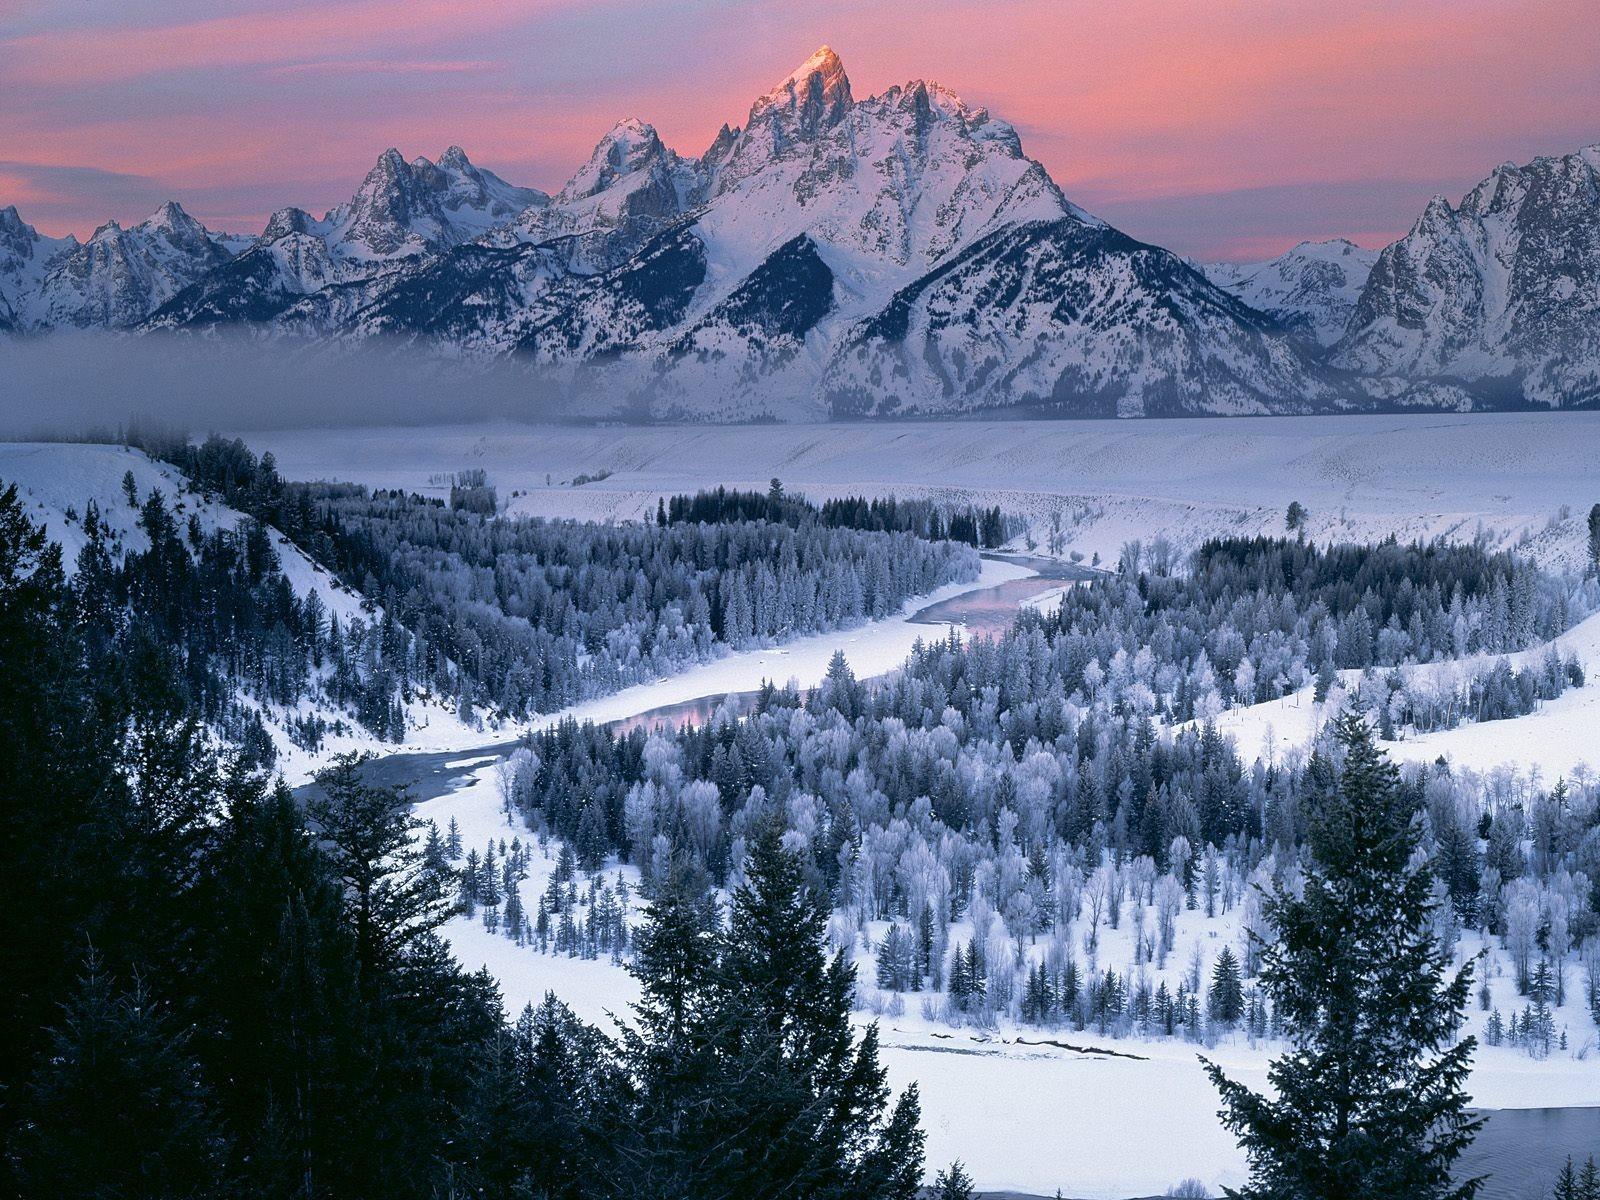 winter wallpaper free